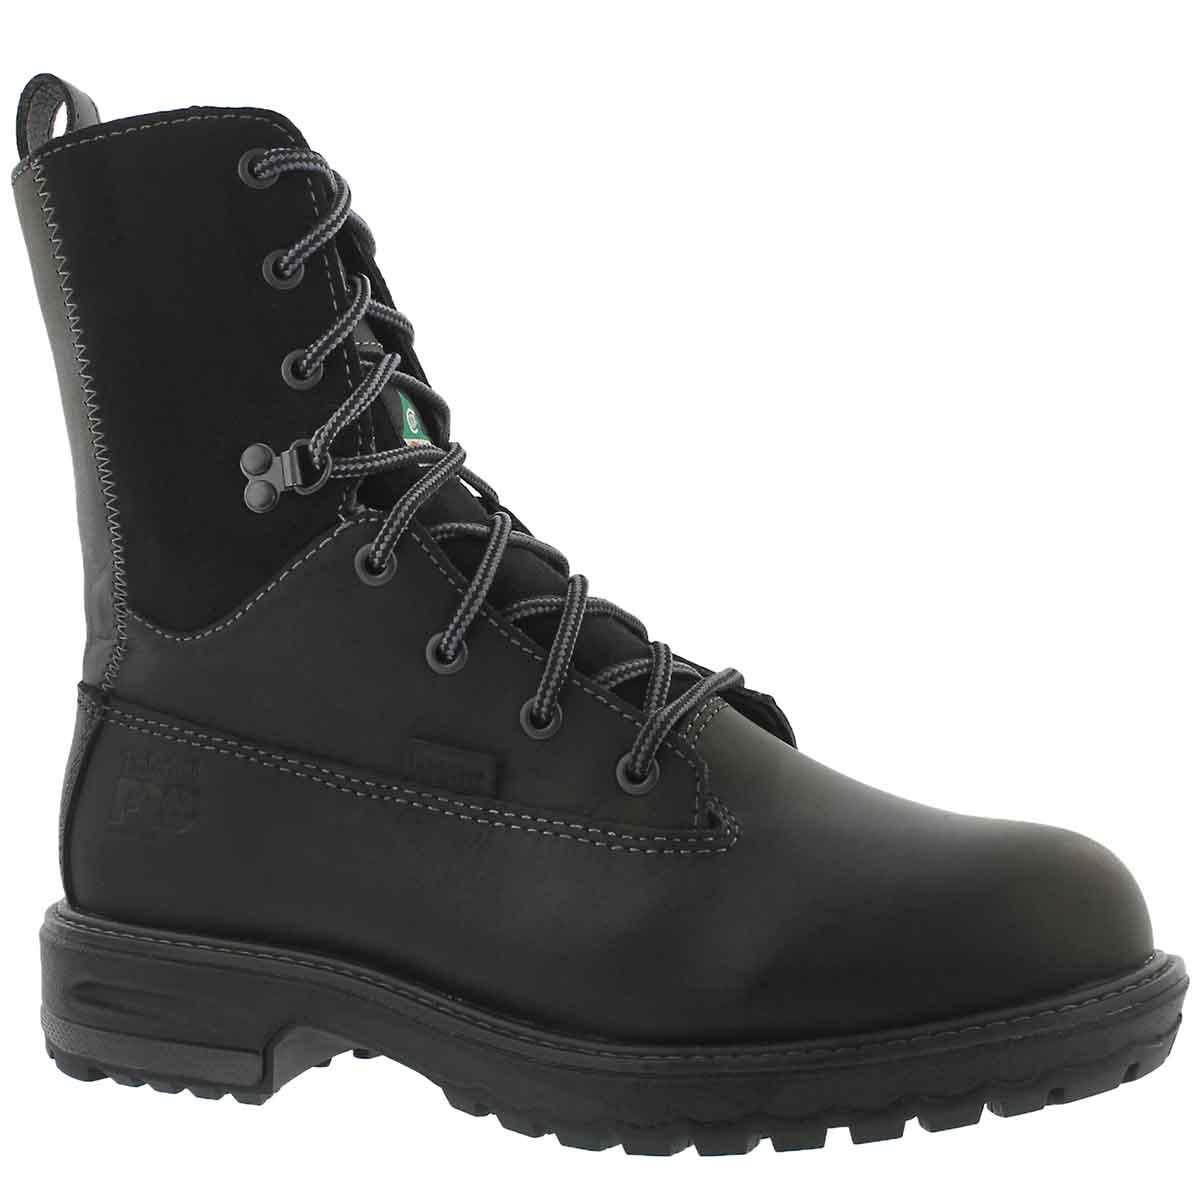 "Women's 8"" HIGHTOWER black waterproof CSA boots"